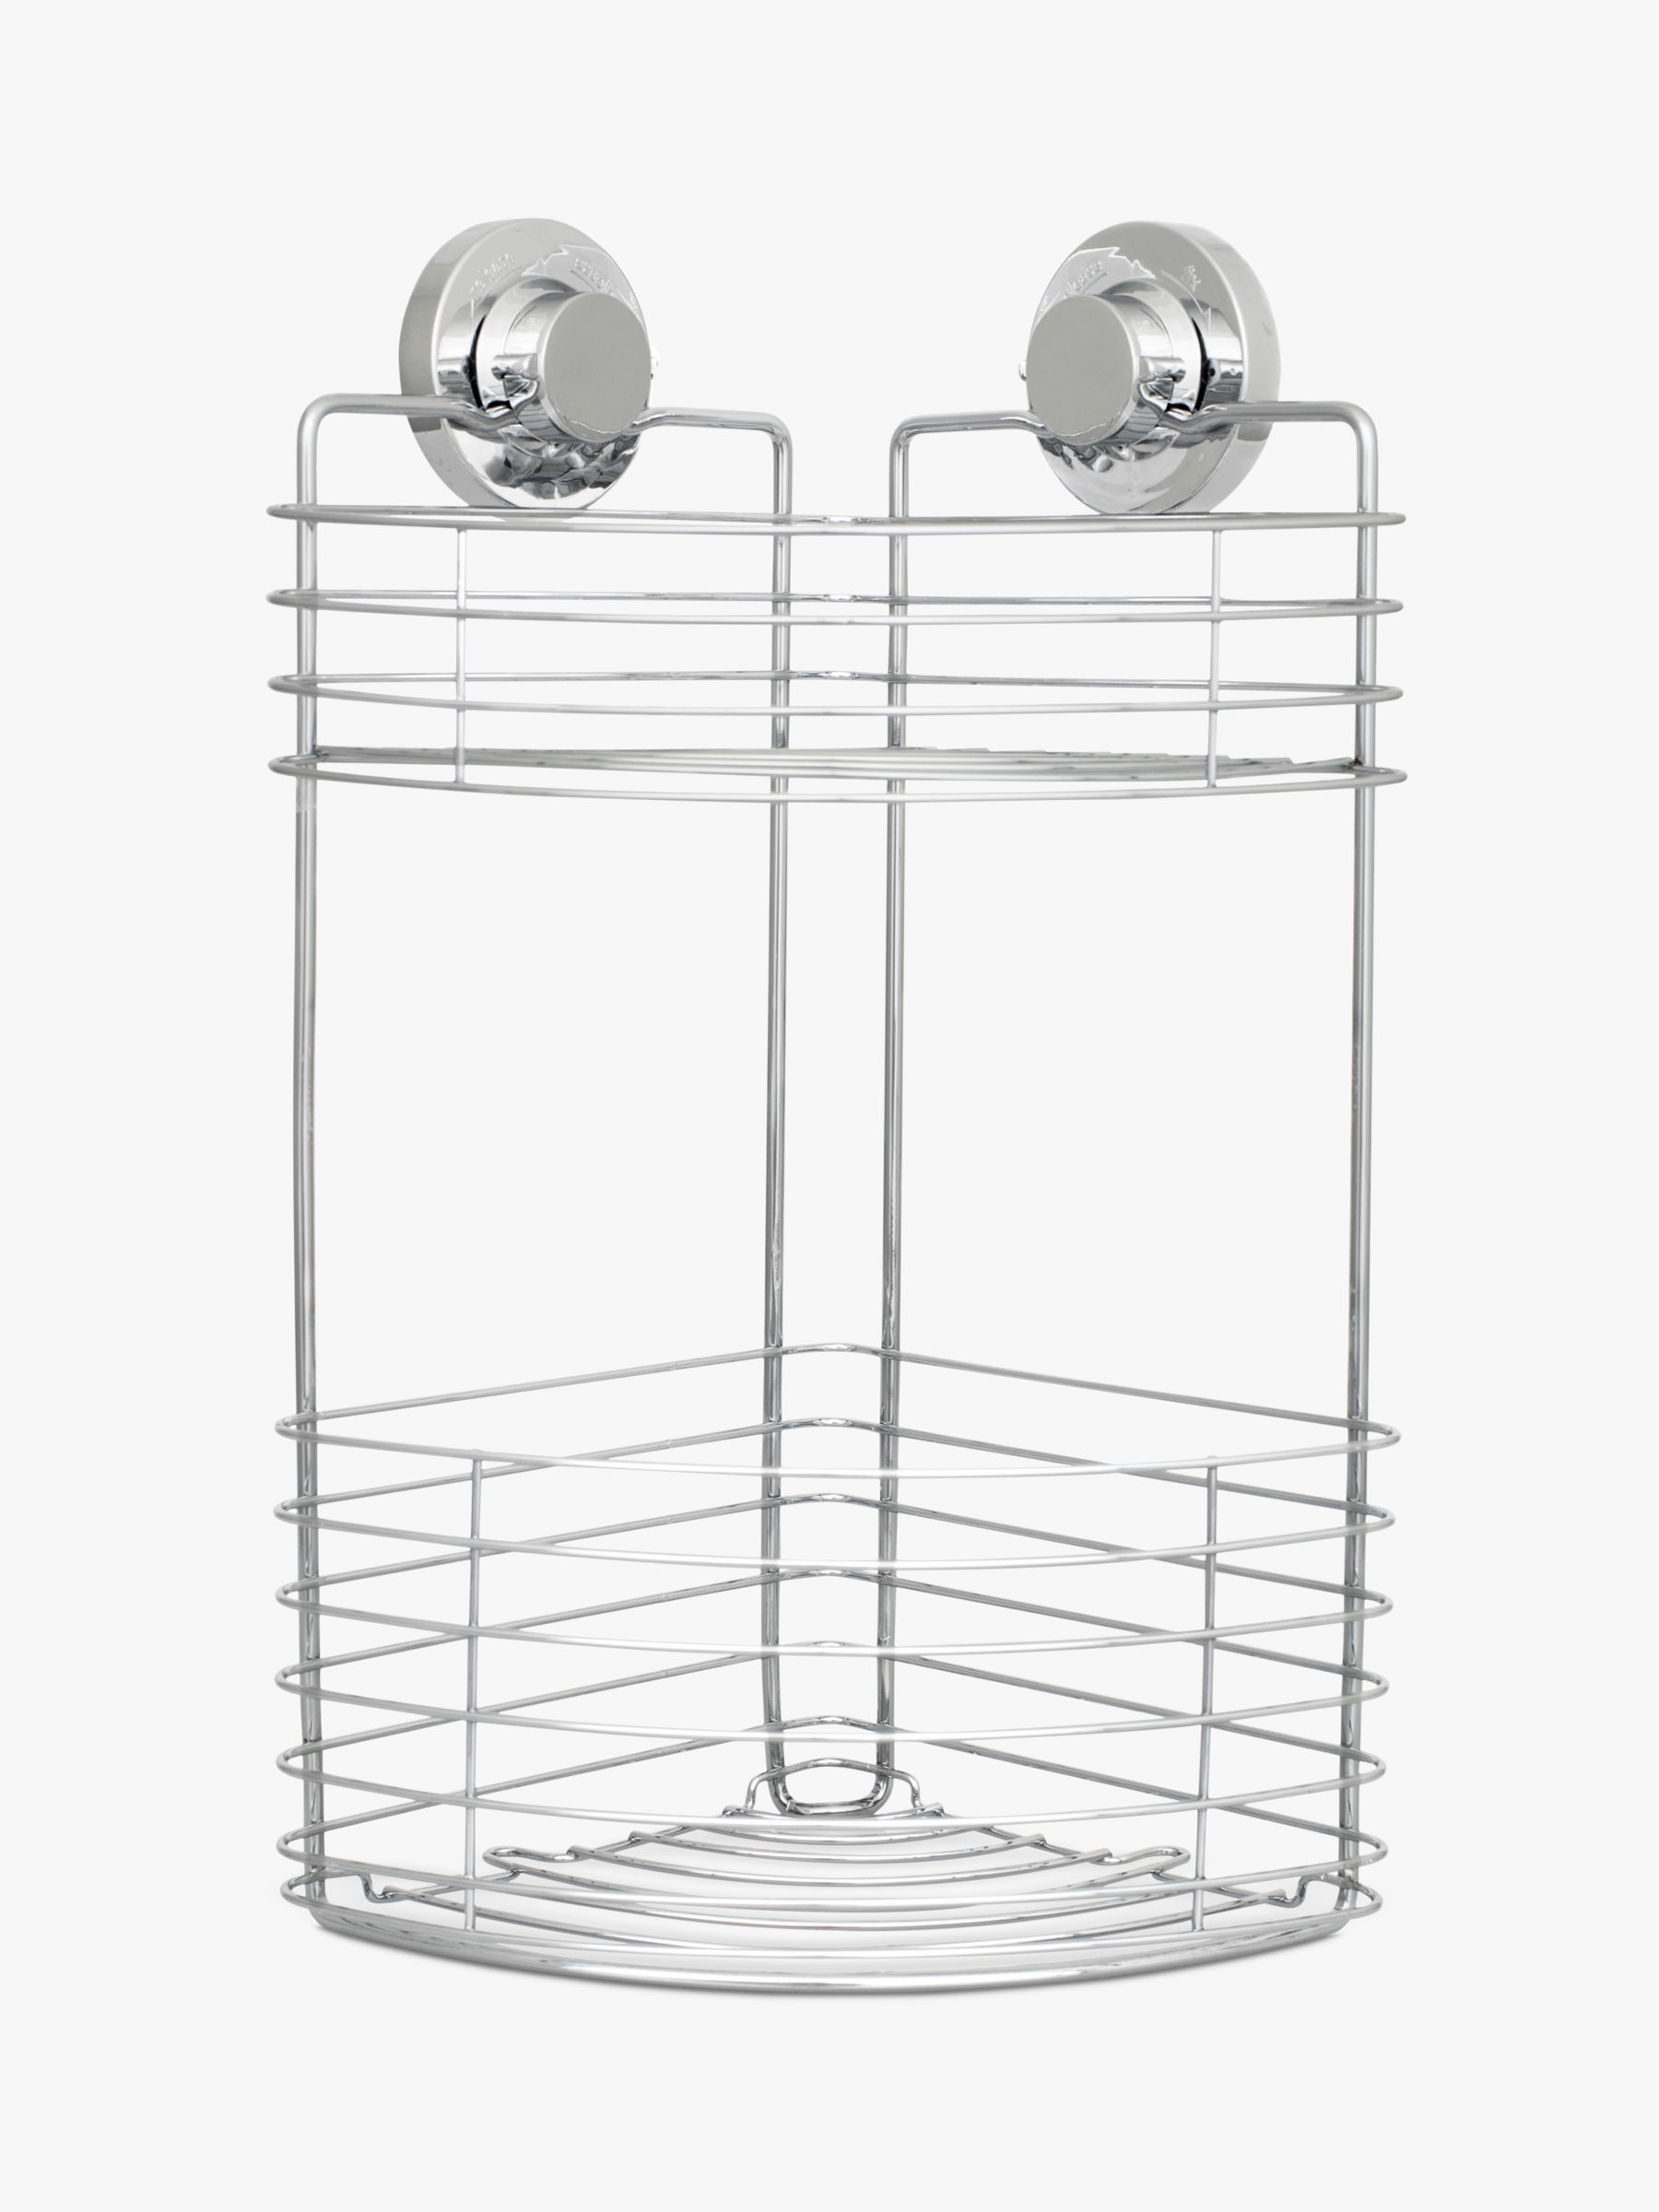 Bliss Bliss Lock N Roll 2 Tier Suction Shower Corner Basket